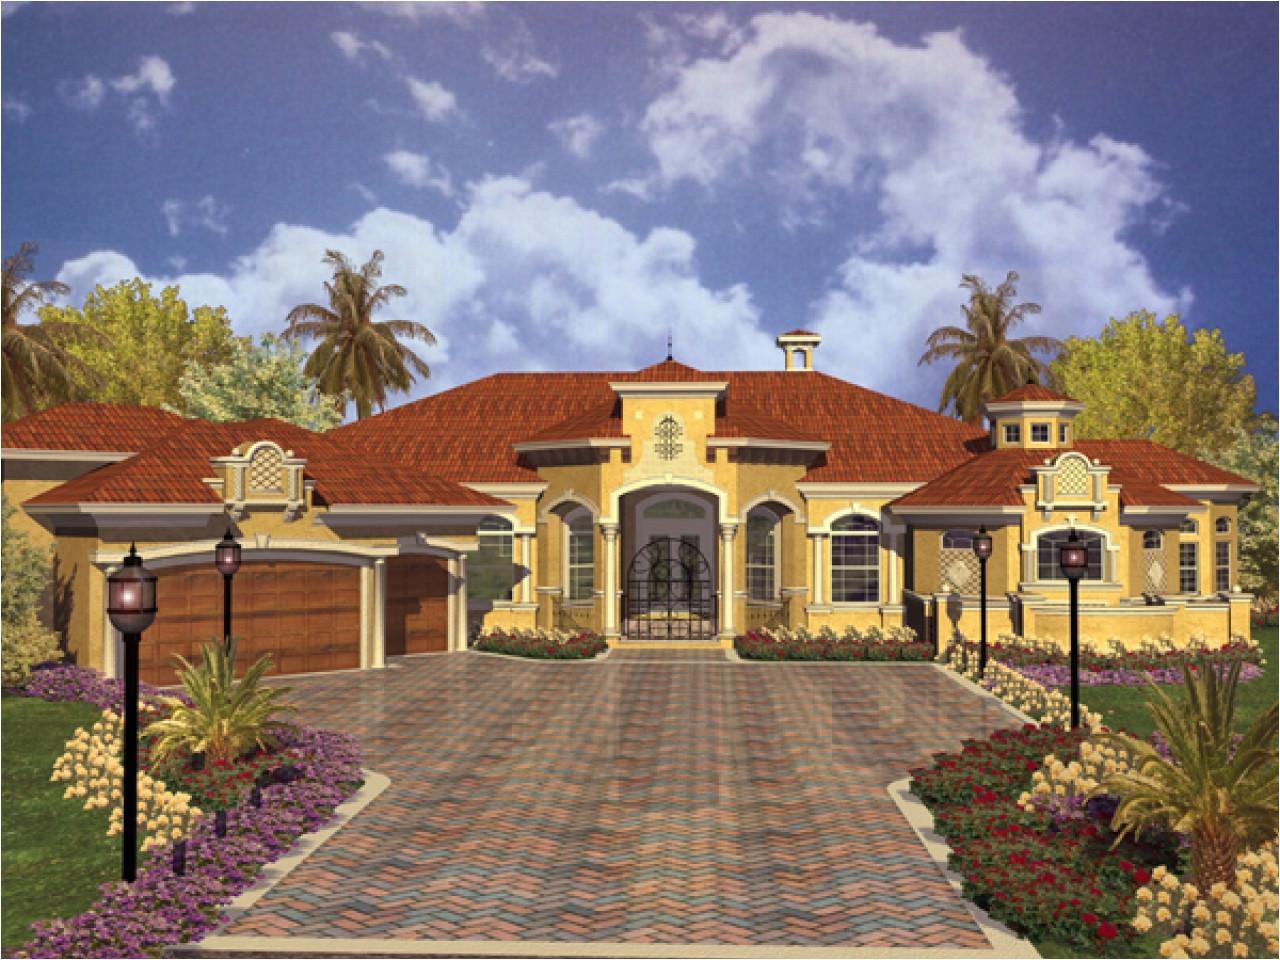 7af9e1154e5bf432 italian style house spanish style homes house plans